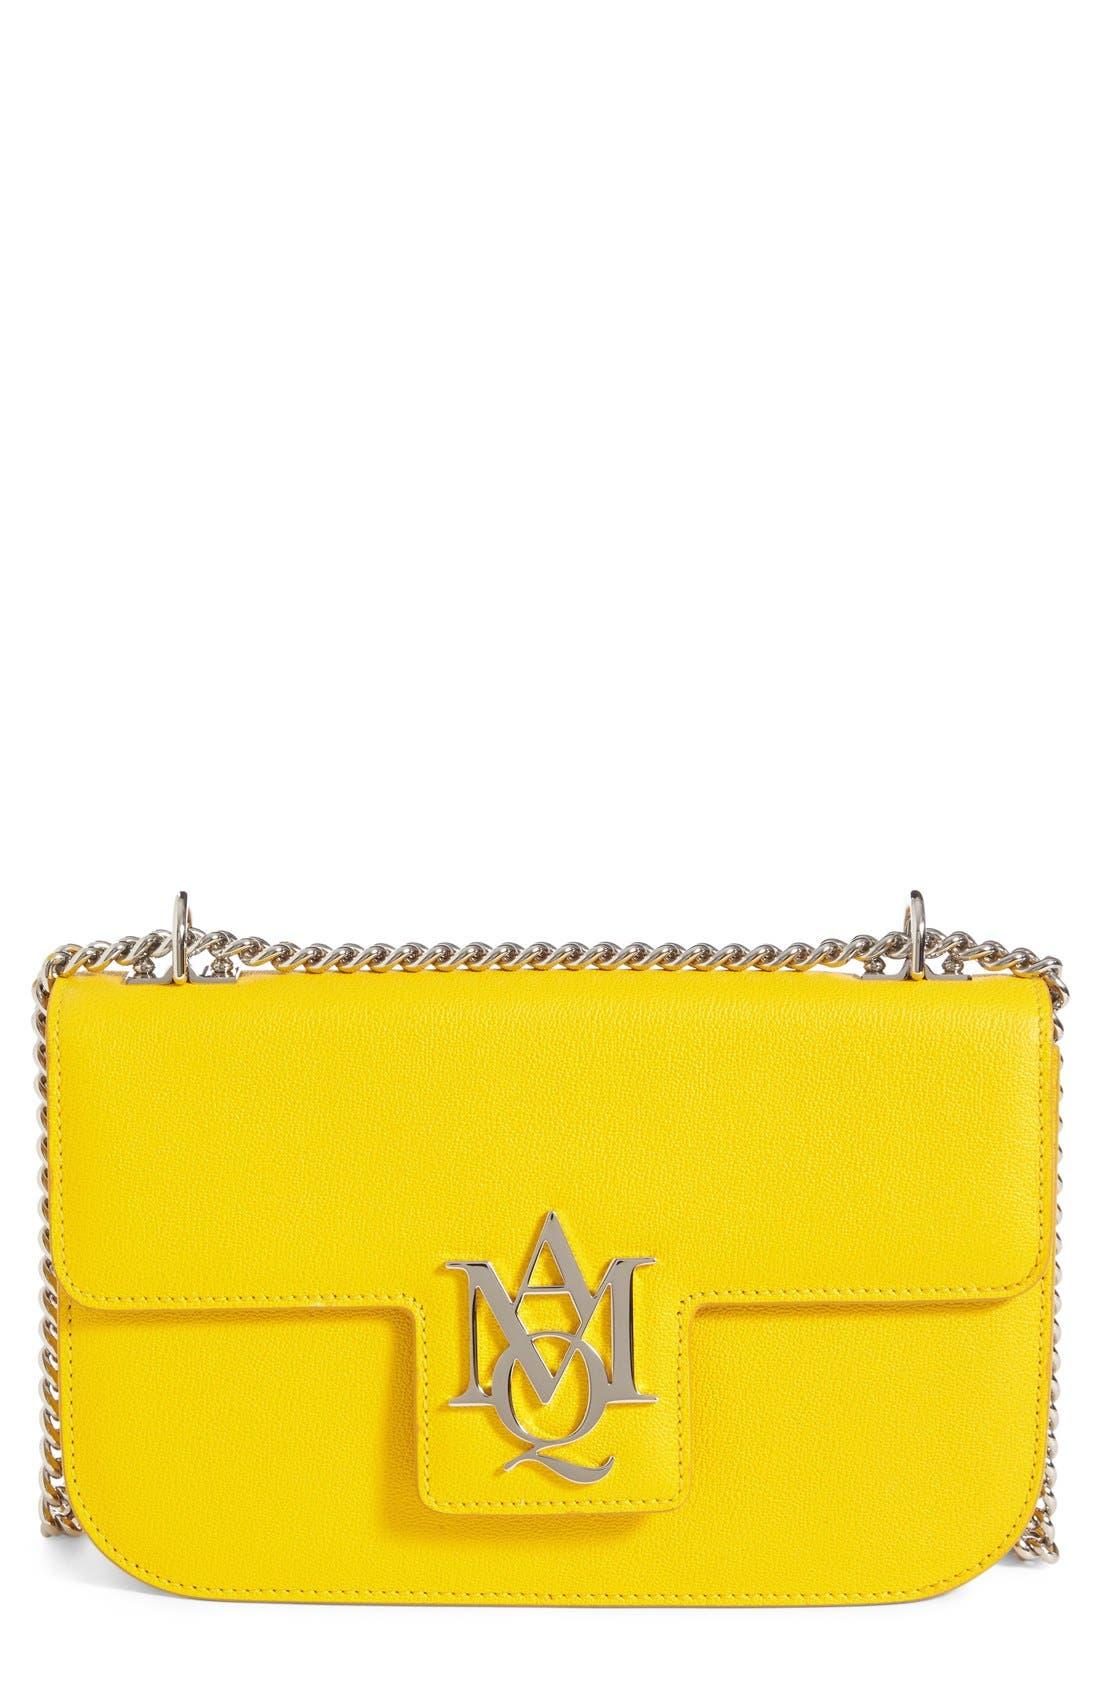 Main Image - Alexander McQueen 'Medium Insignia Chain' Calfskin Leather Satchel